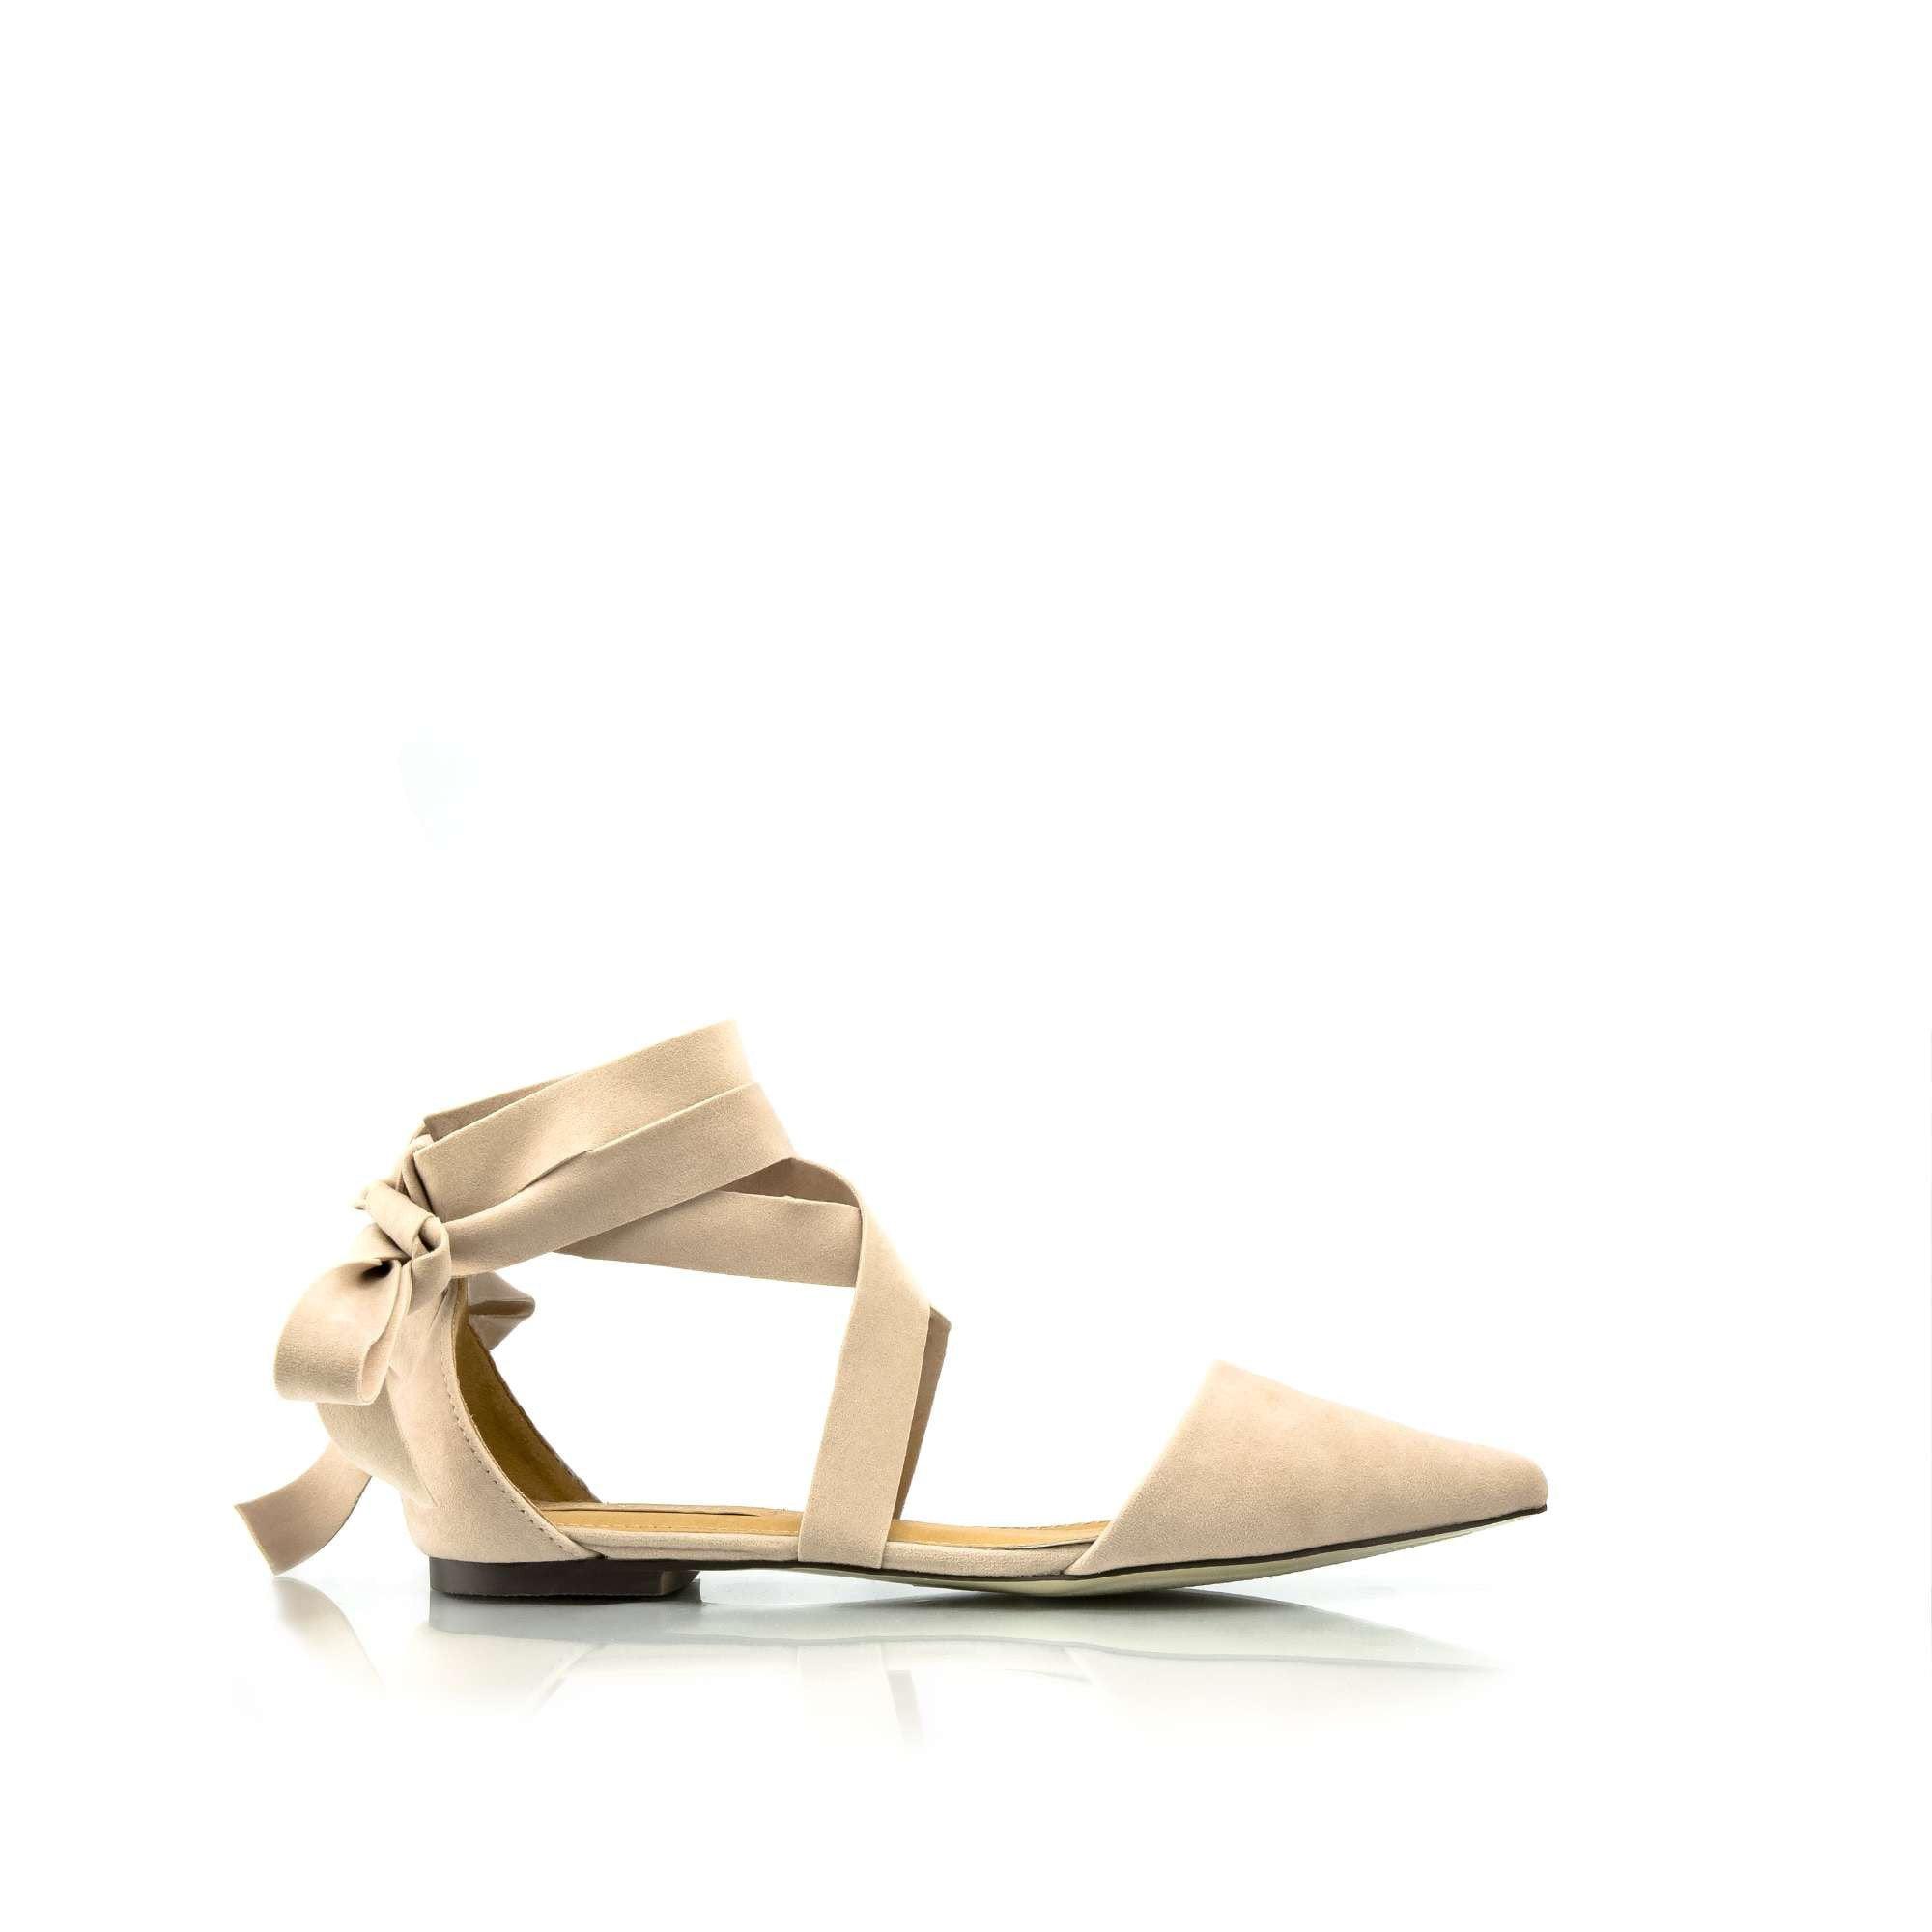 LOLA Ankle Wrap Flats